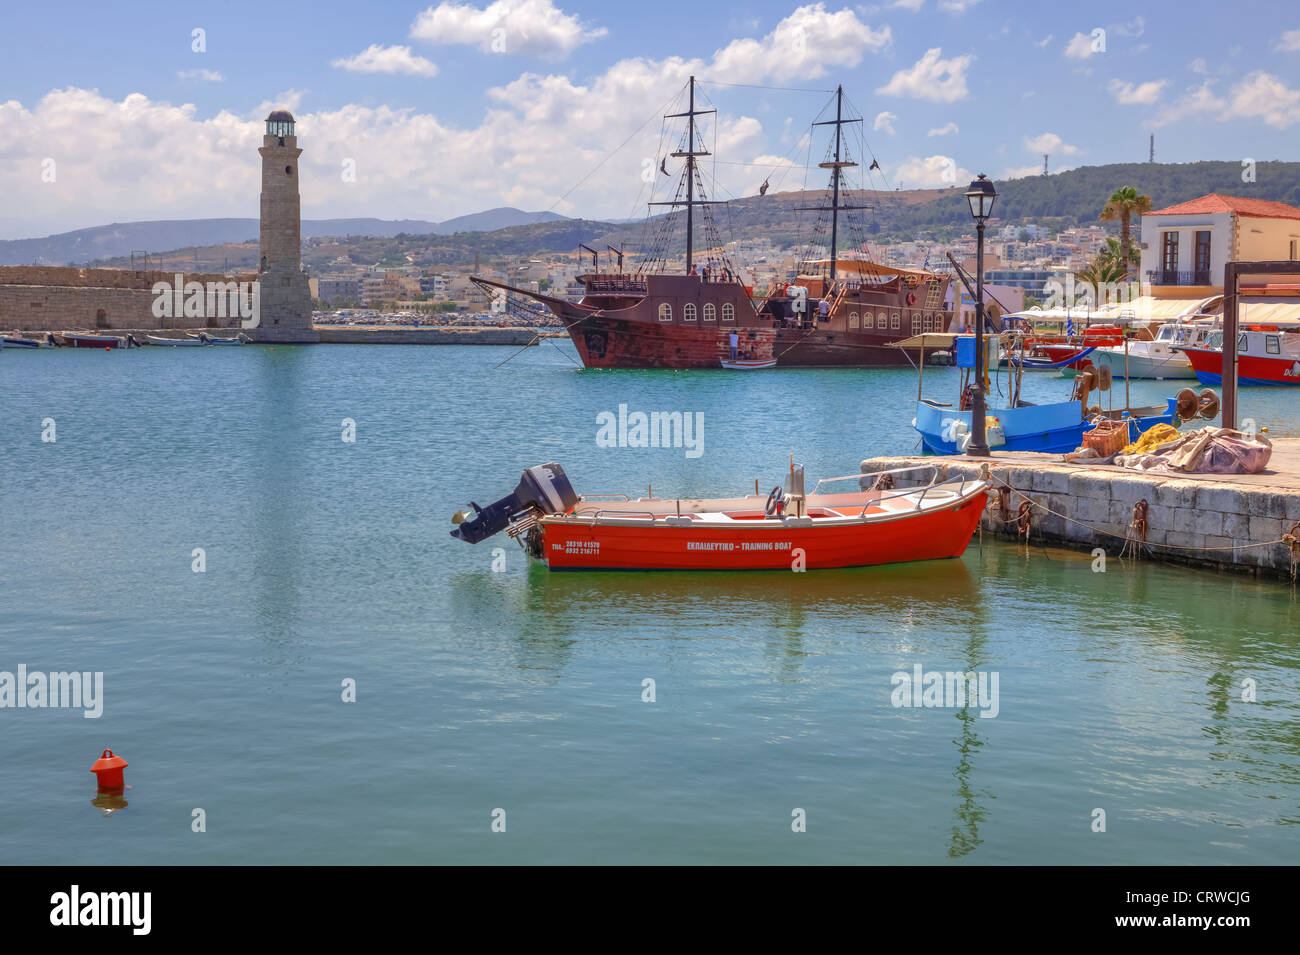 Venetian Port, Rethymno, Crete, Greece - Stock Image